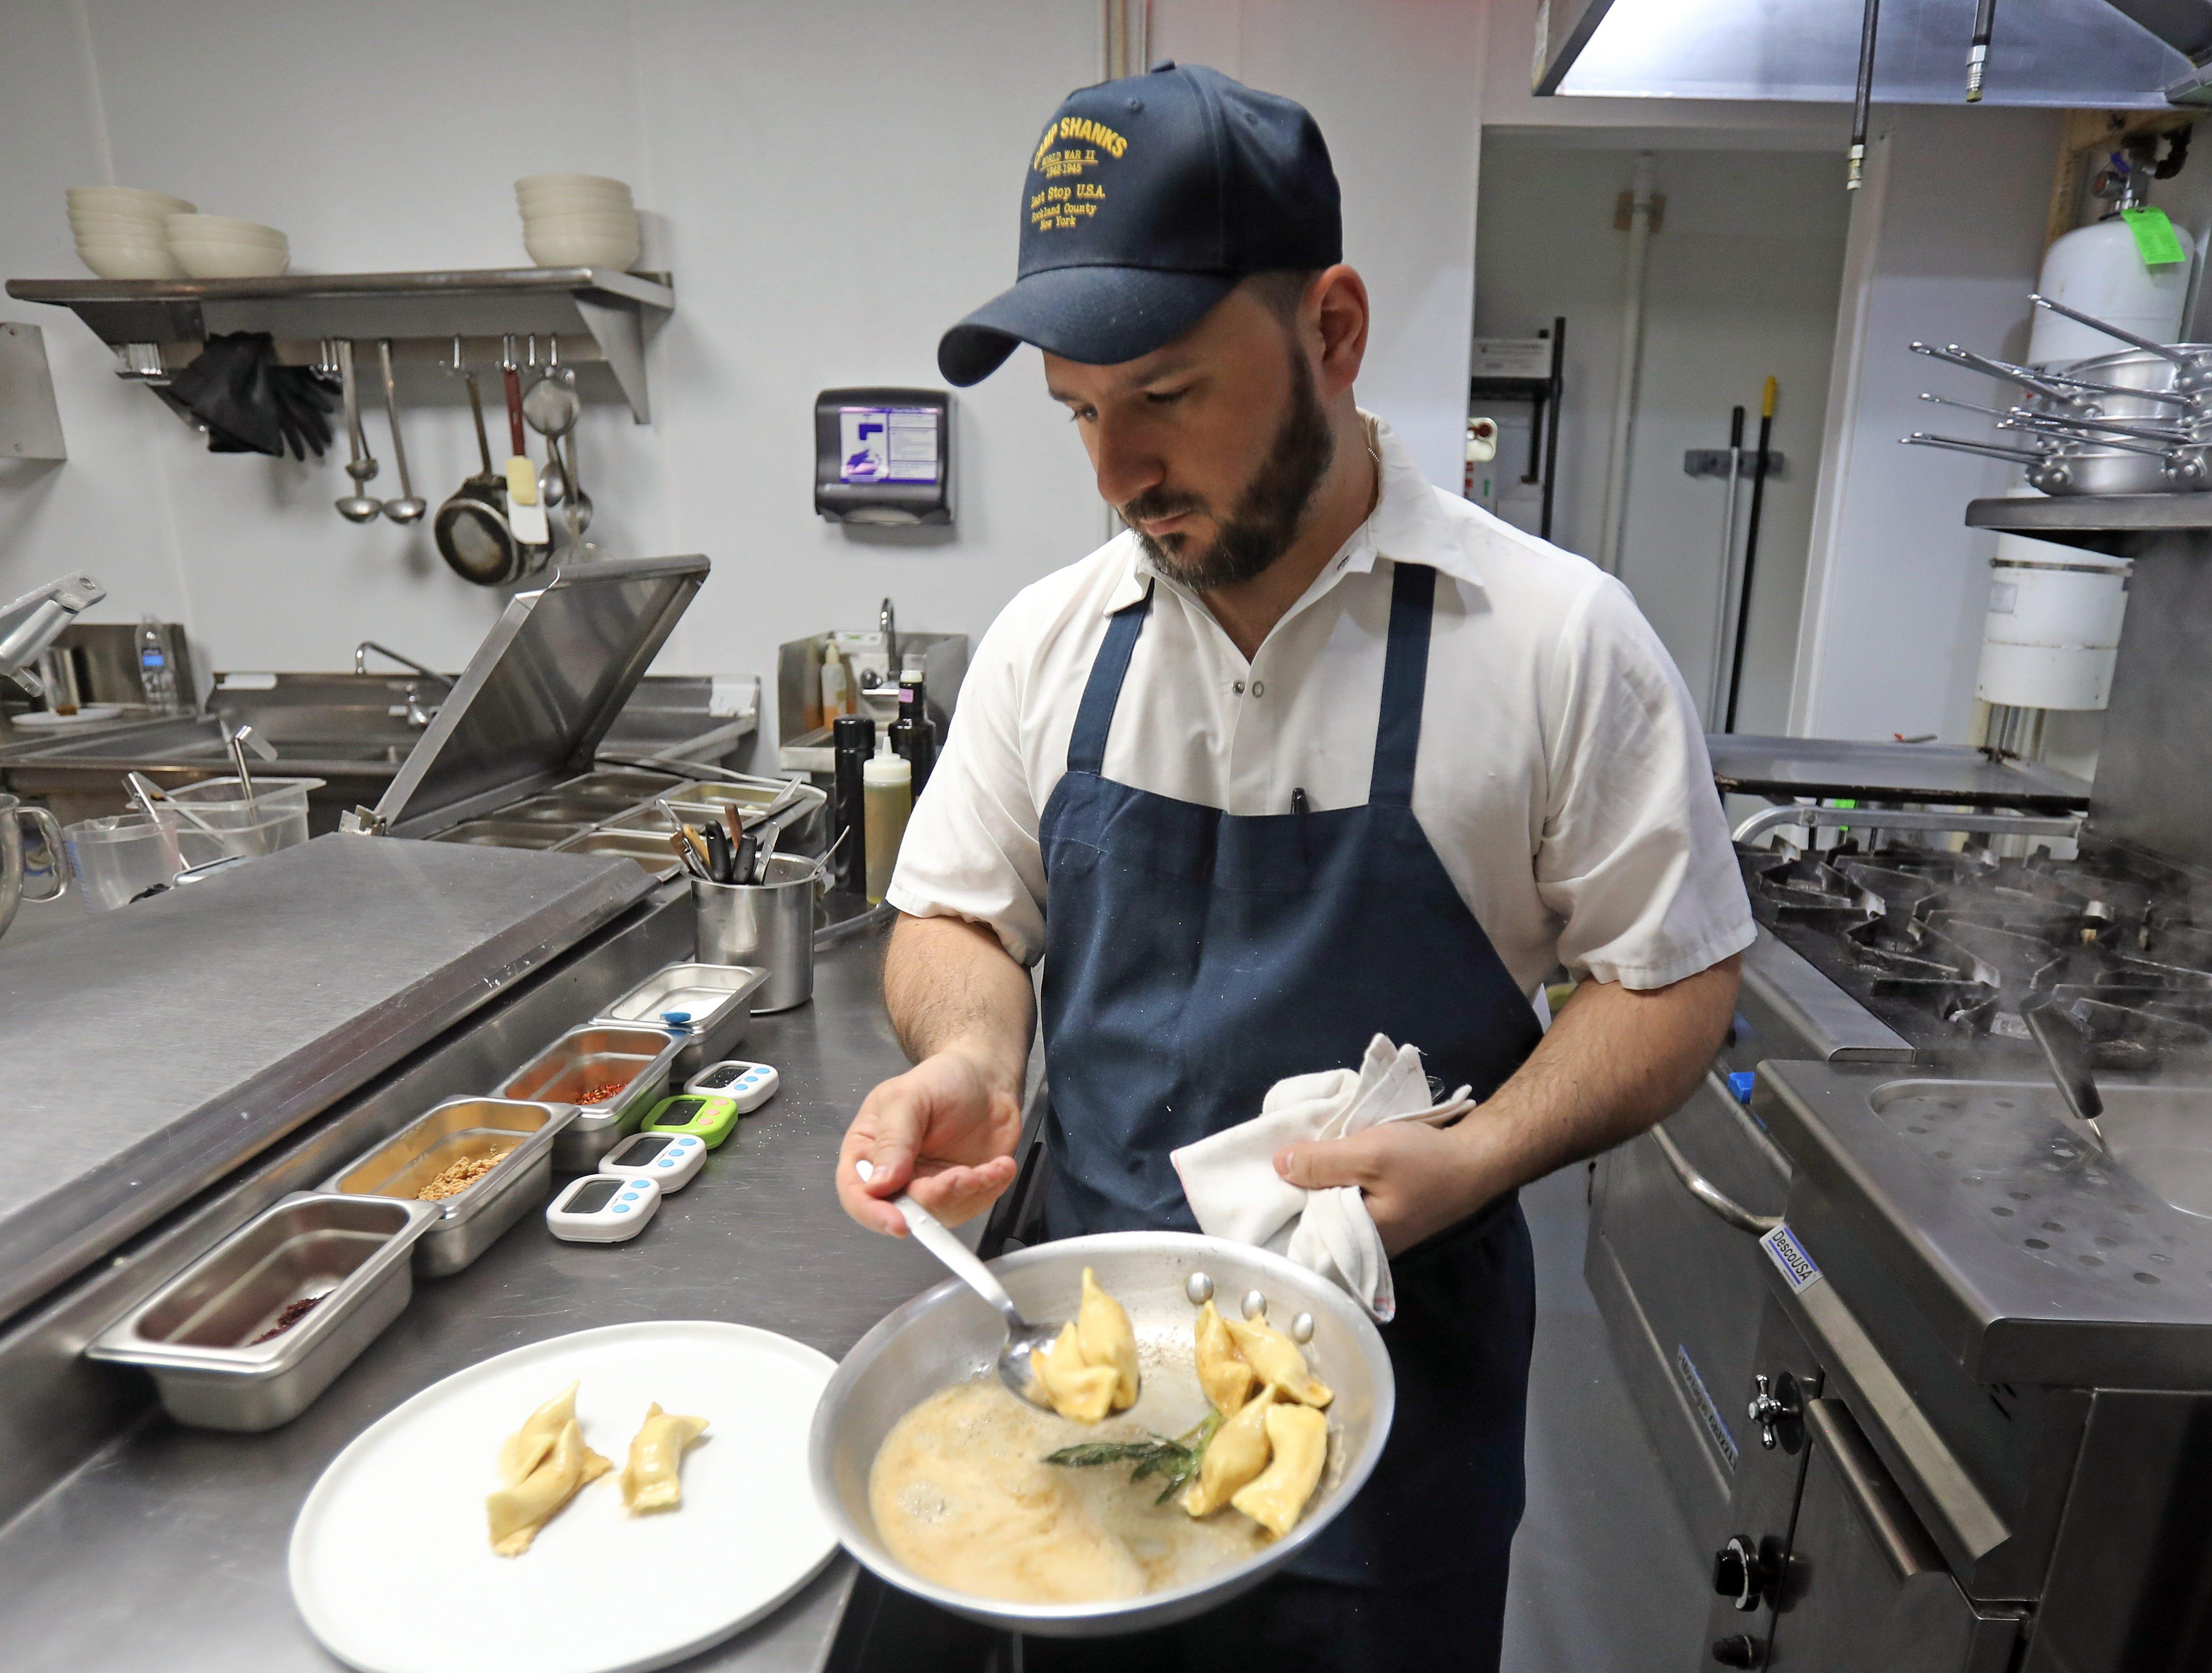 Tony Scotto, owner of DPNB Pasta & Provisions prepares pumpkin scarpinocc at the restaurant in Nyack on Jan. 31, 2019.